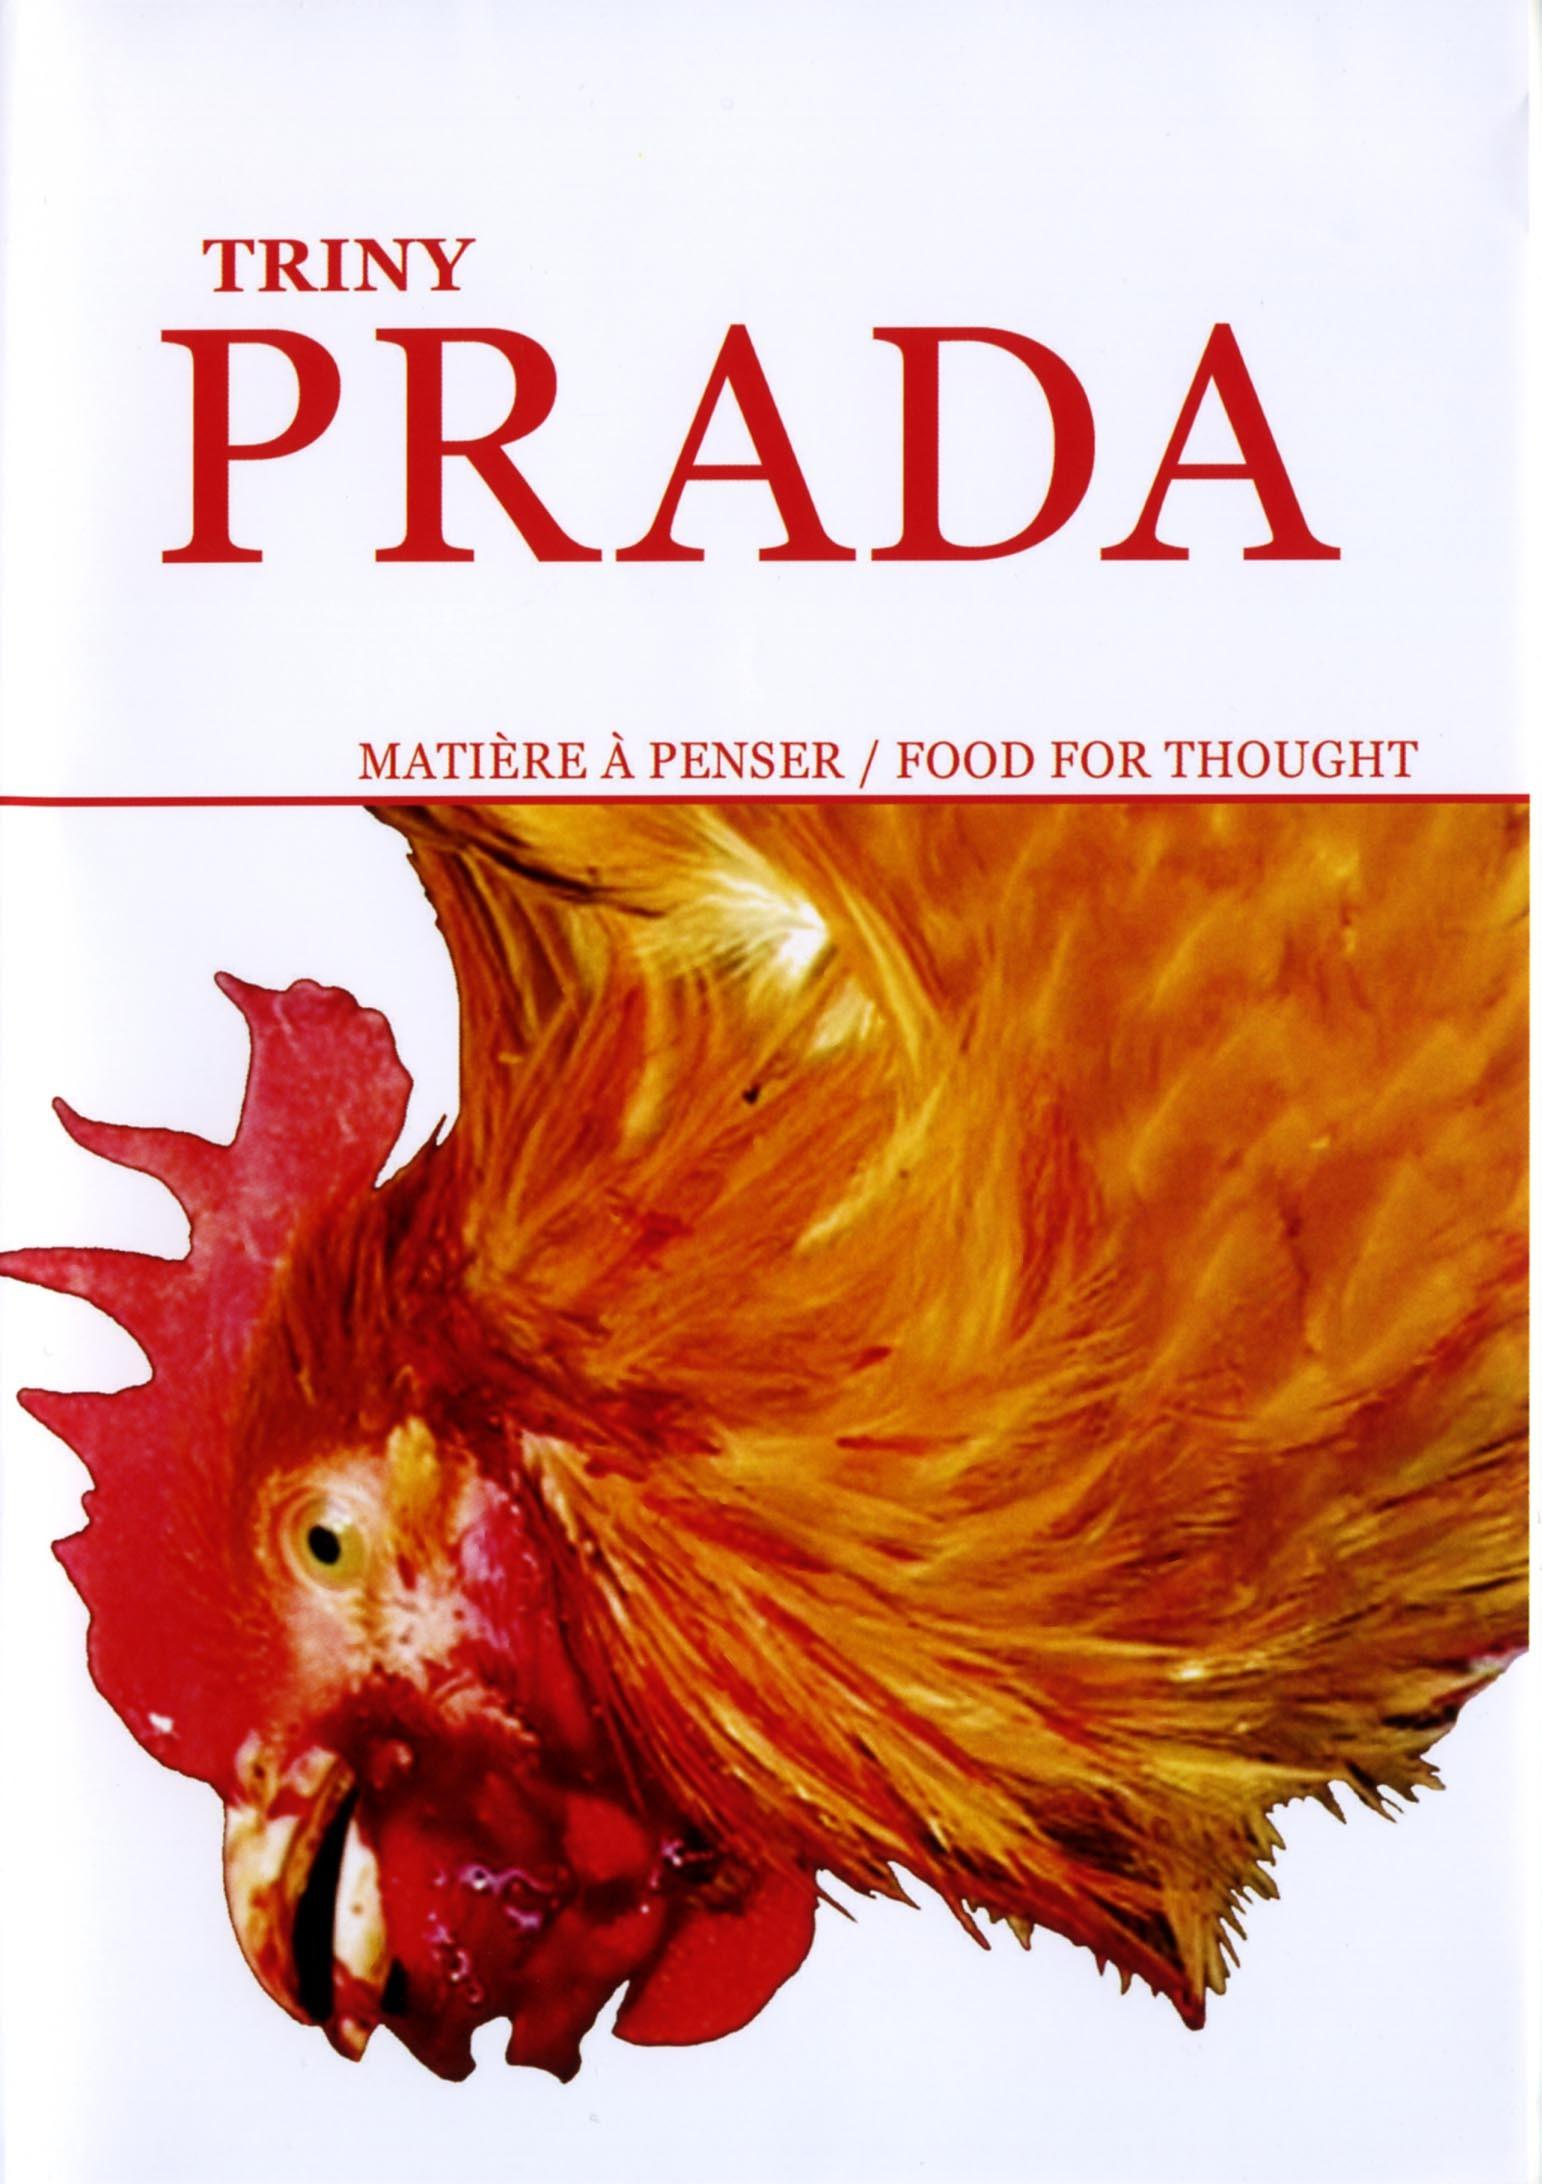 LOW - TRINY PRADA - DVD